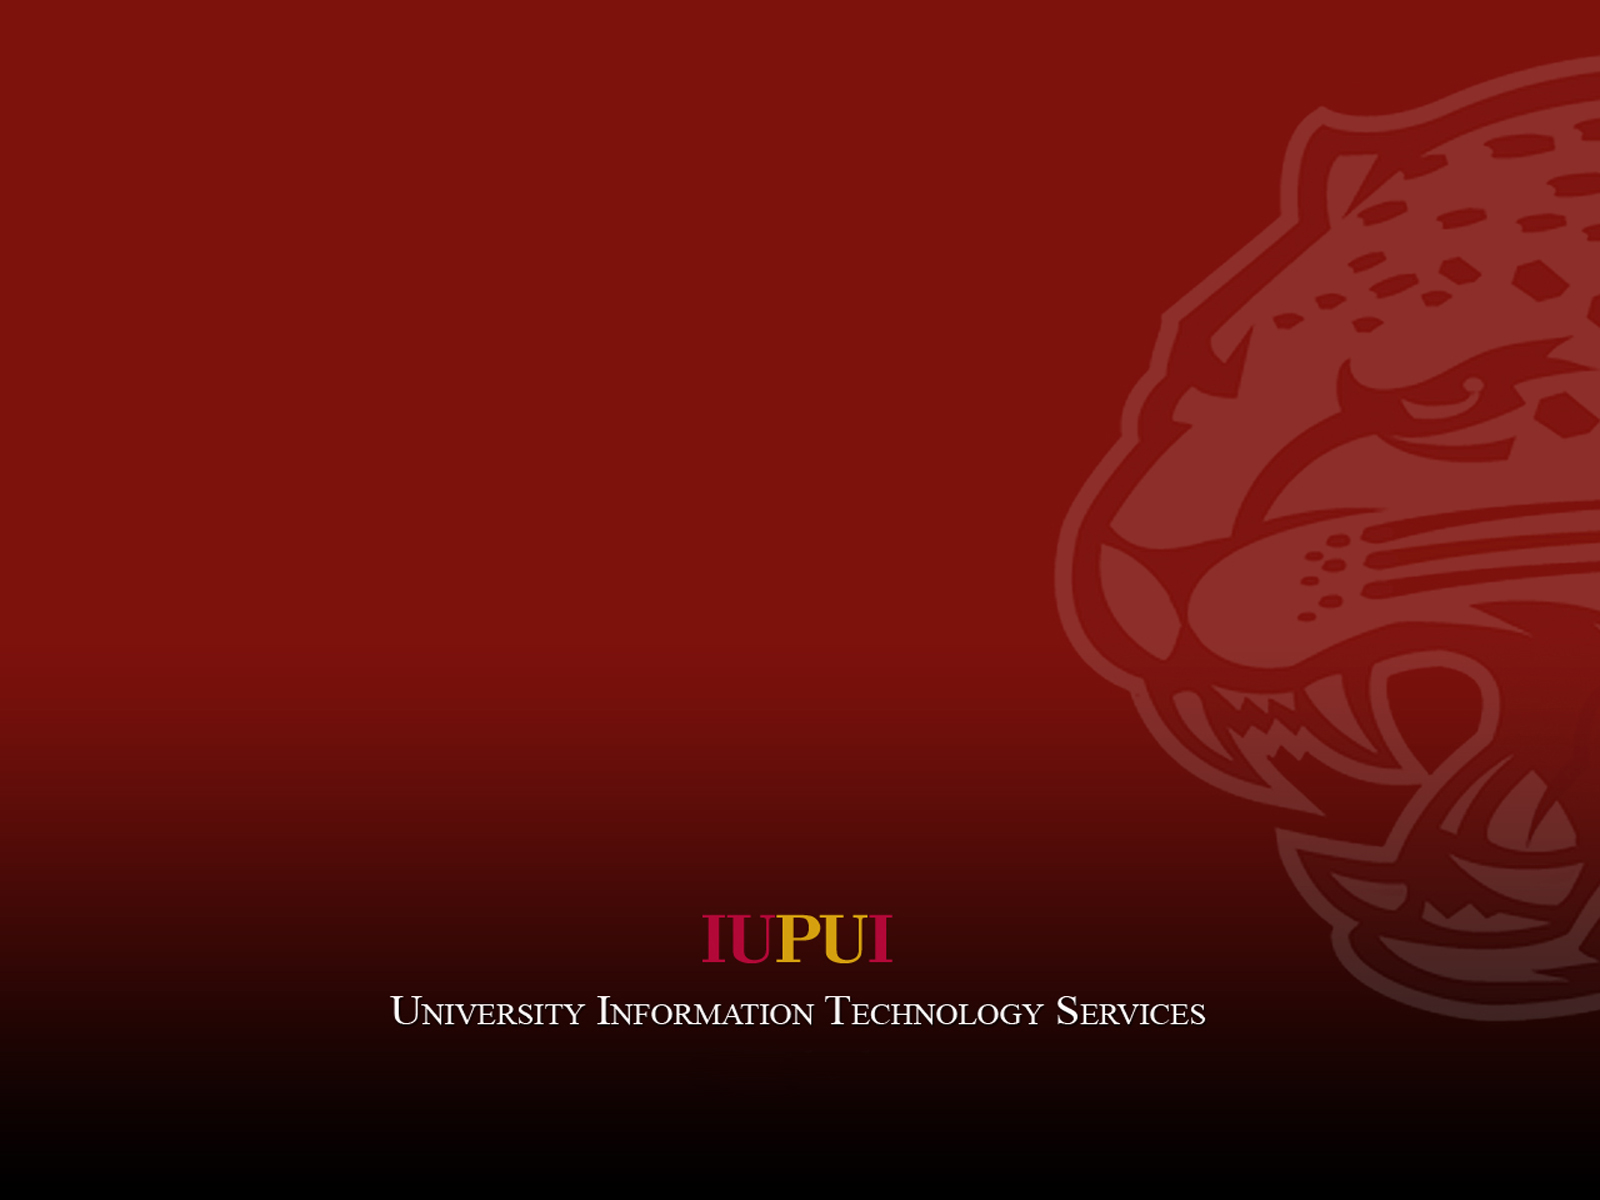 indiana university screensaver 1600x1200